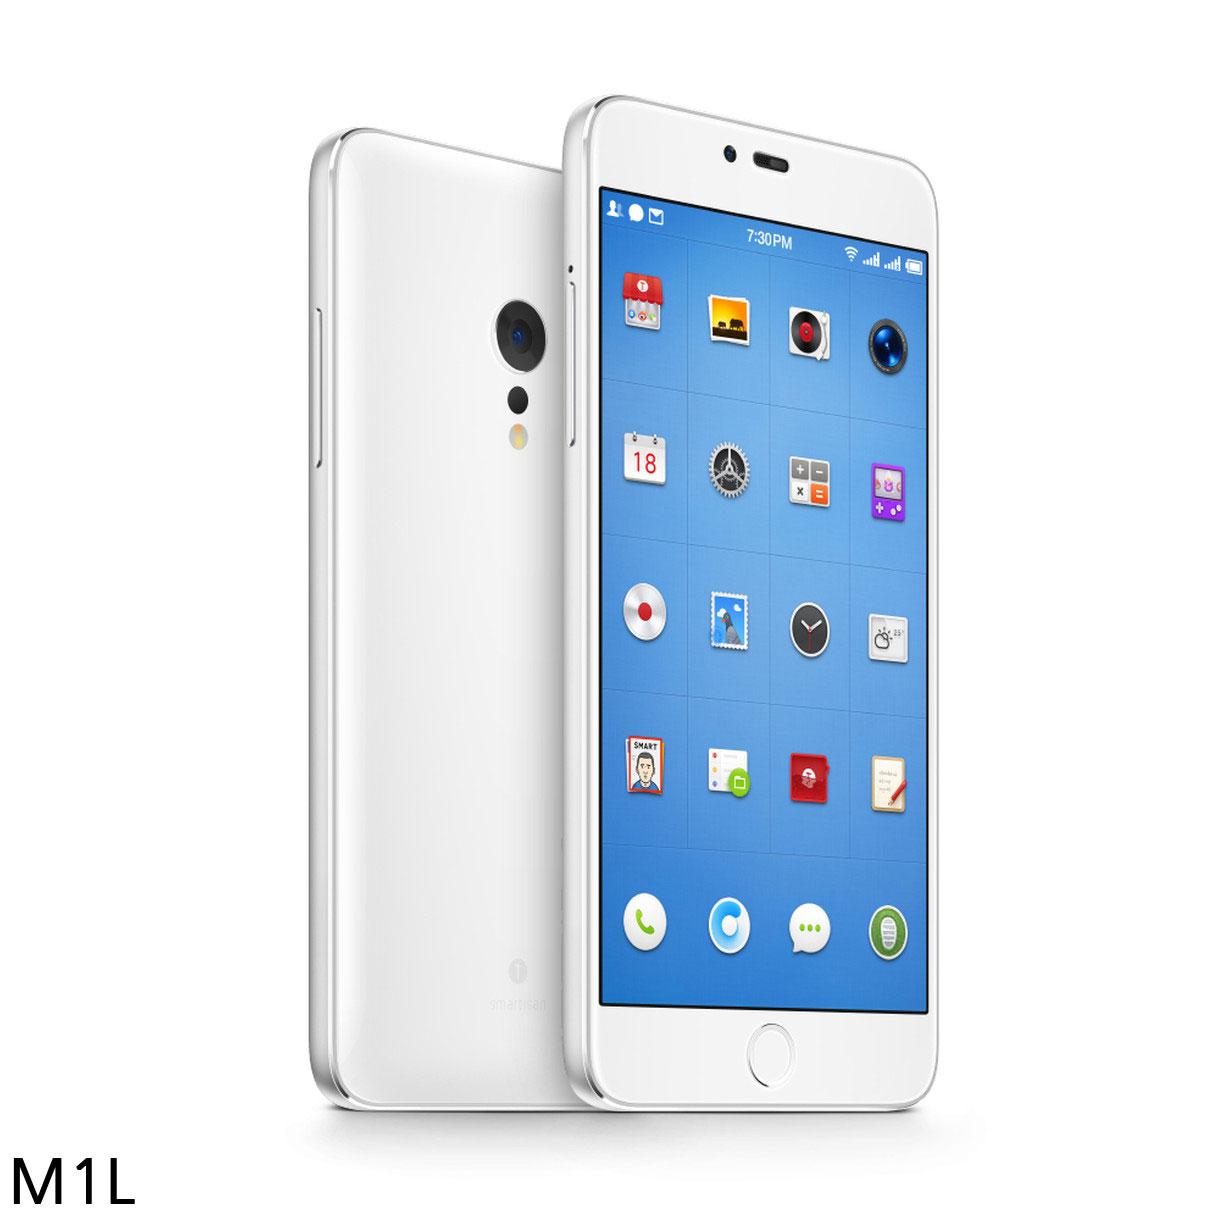 M1_M1L_11.jpg